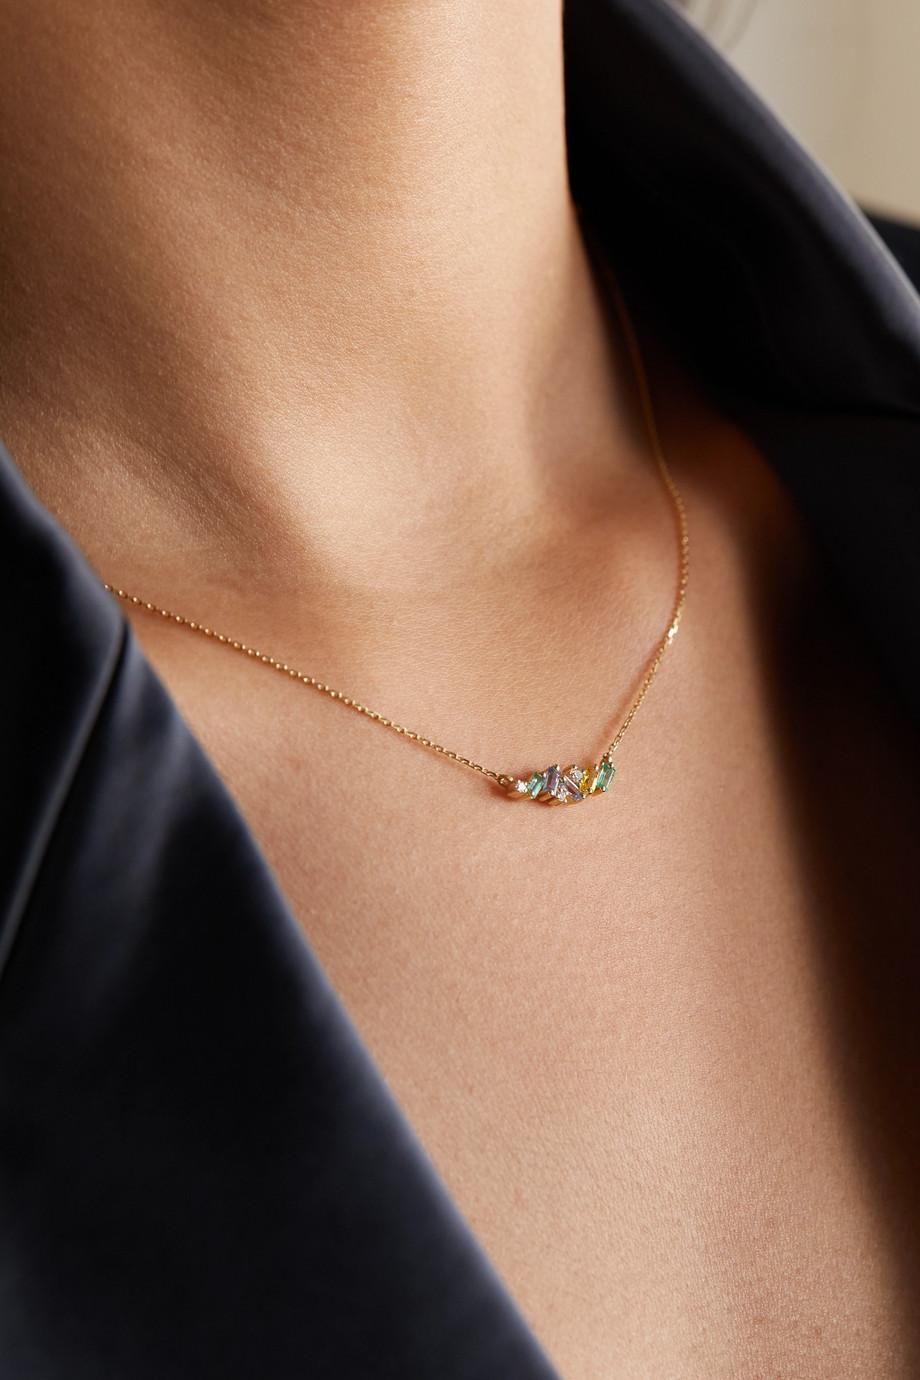 Suzanne Kalan 18-karat gold multi-stone necklace